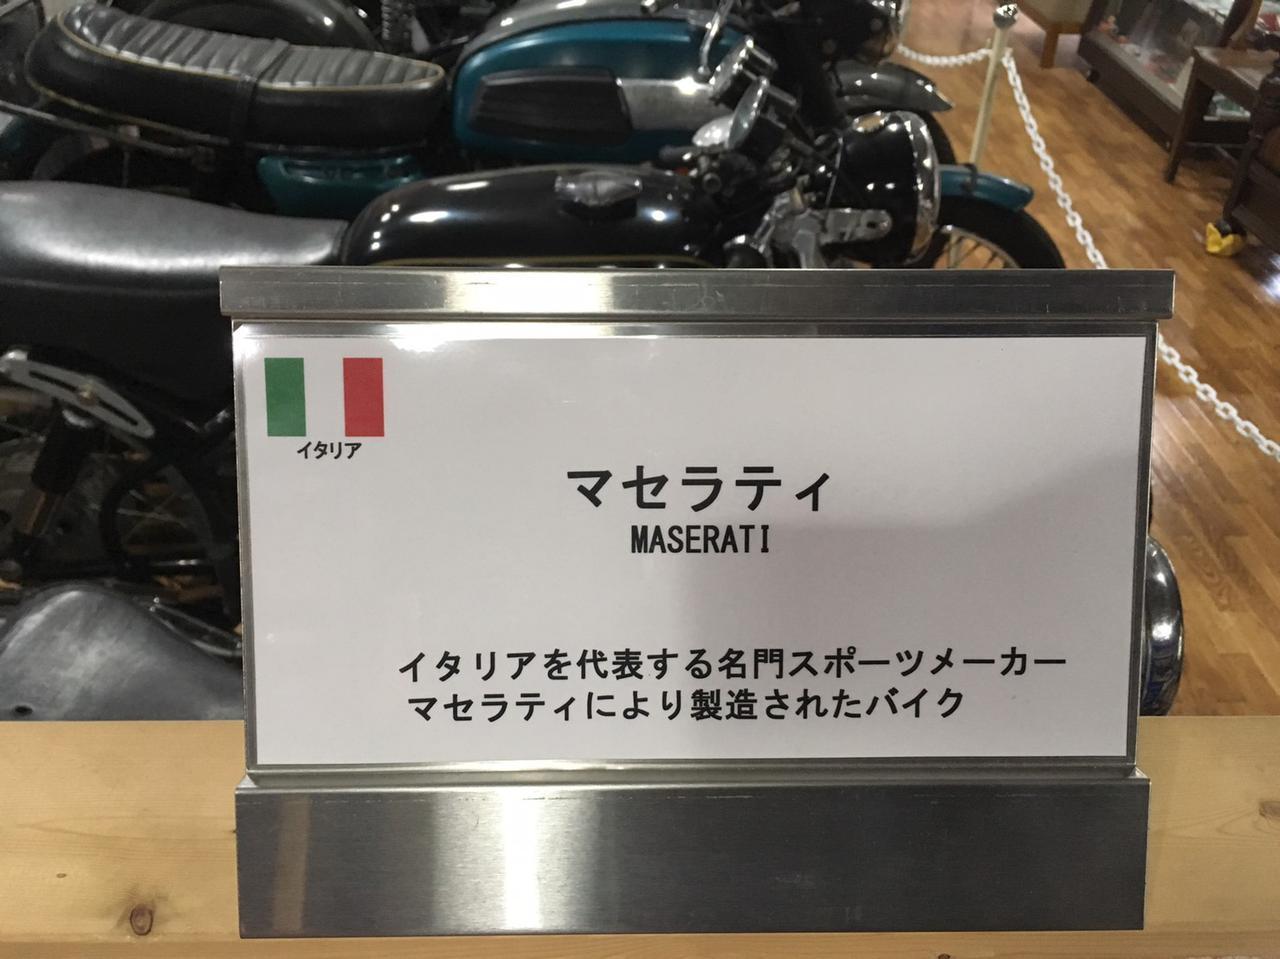 Images : 8番目の画像 - 福山理子が撮影した岩下コレクションの写真 - webオートバイ